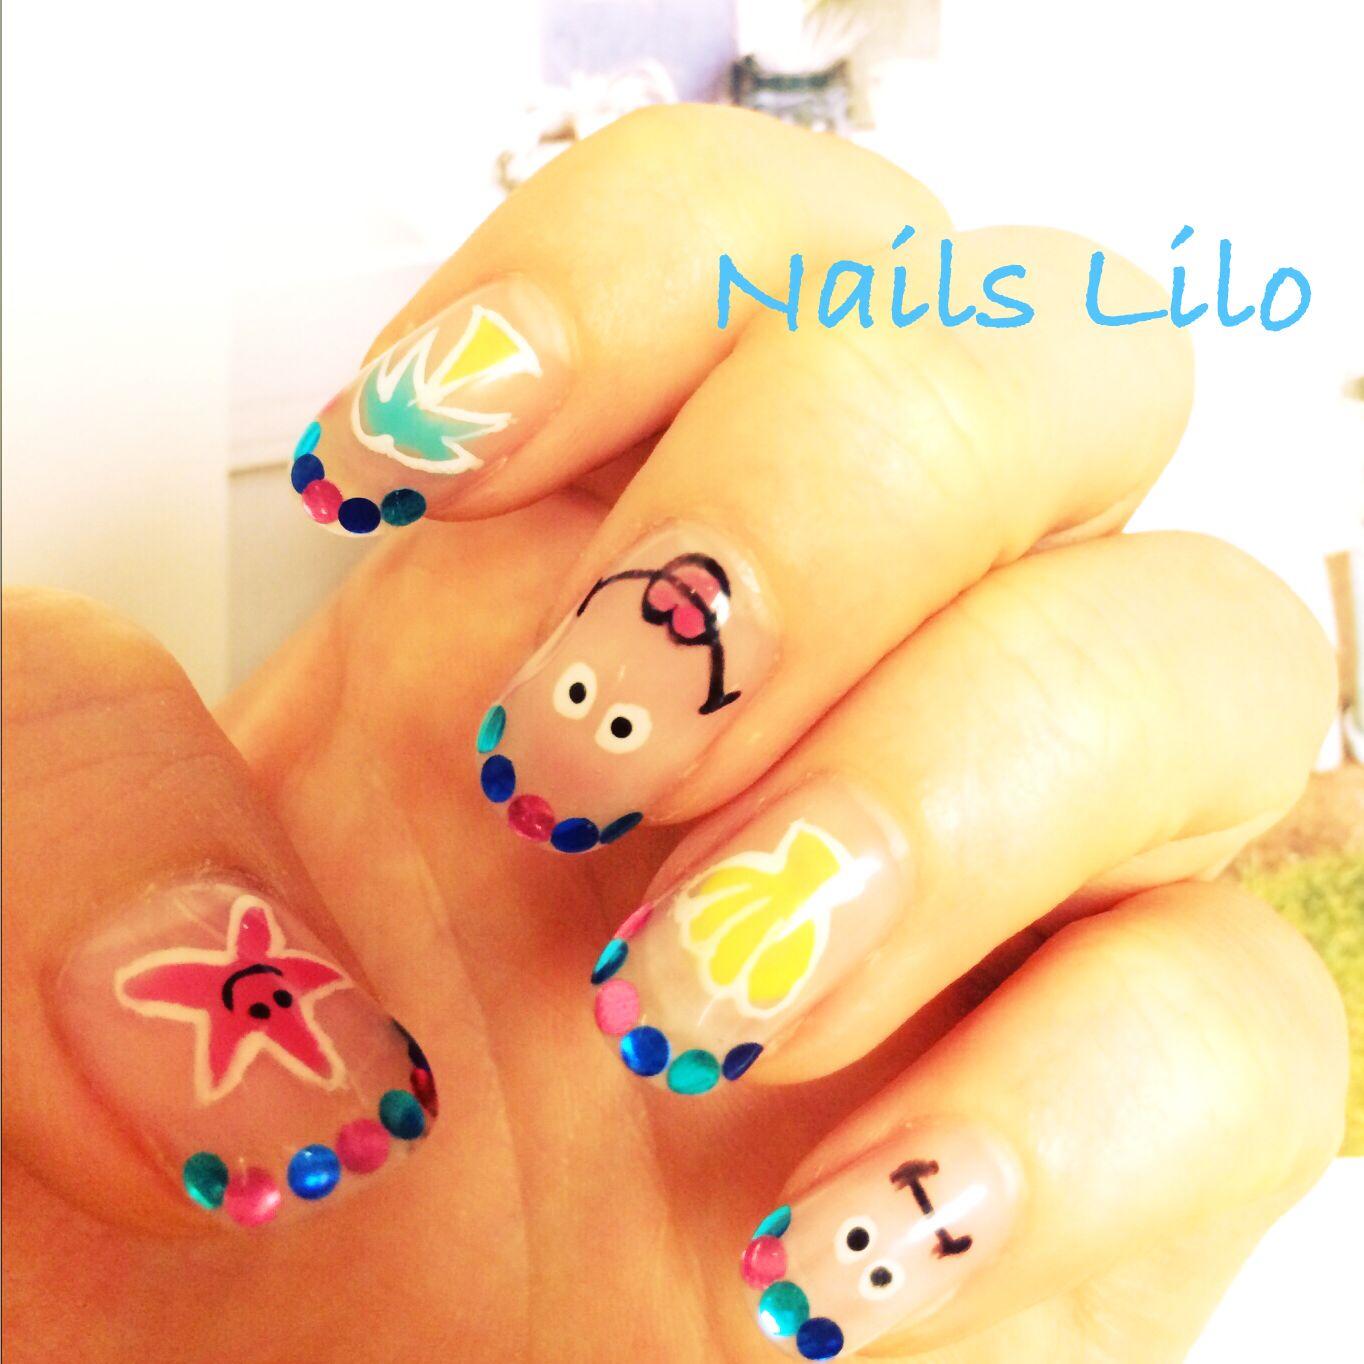 #Nails Lilo @kyoto original nail art   #face. niconico #summer.starfish.pineapple.sun.shell